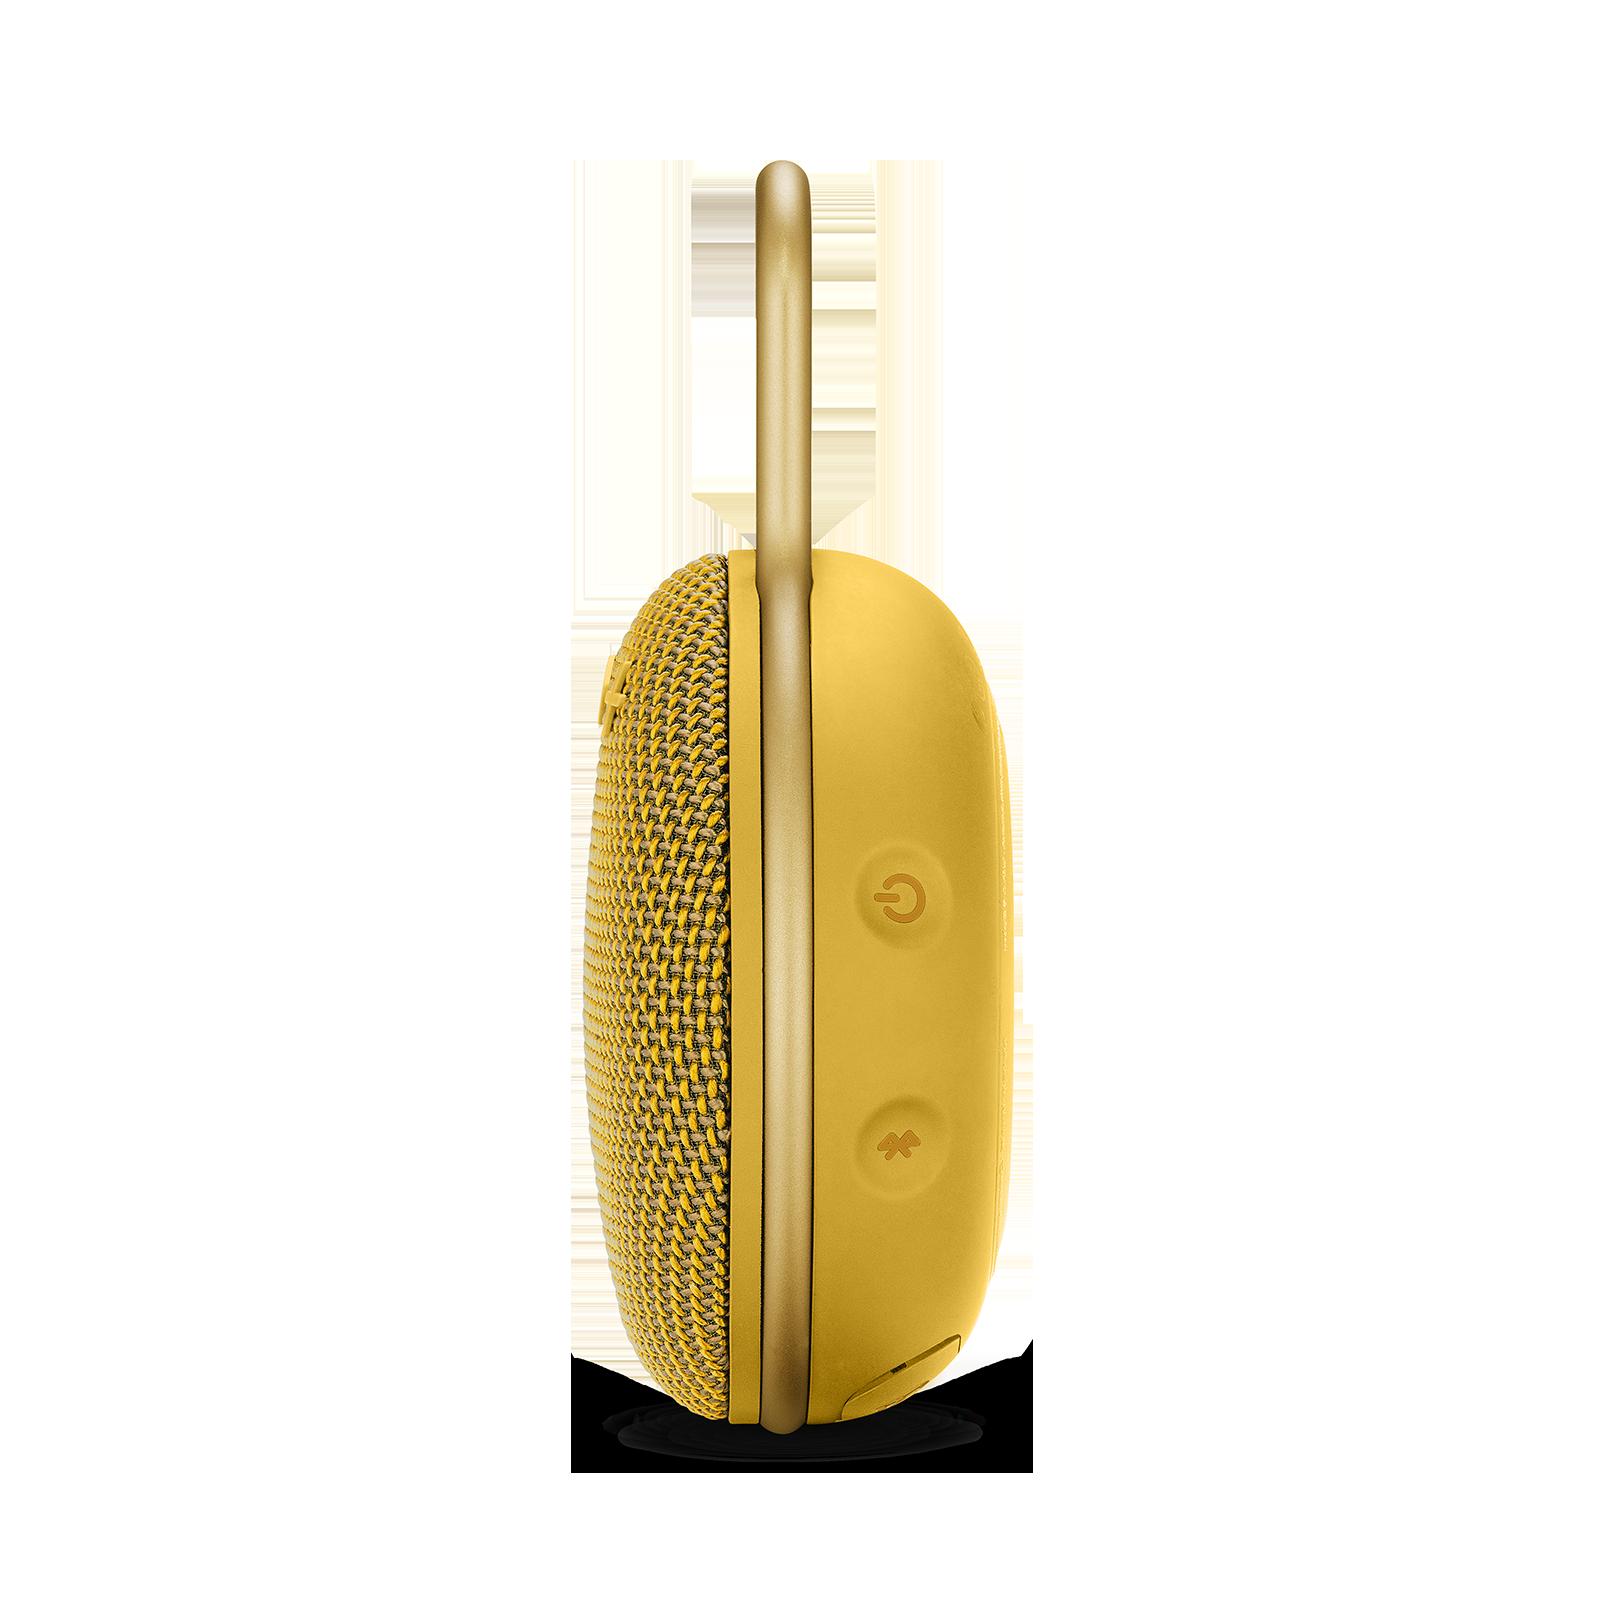 JBL CLIP 3 - Mustard Yellow - Portable Bluetooth® speaker - Detailshot 2